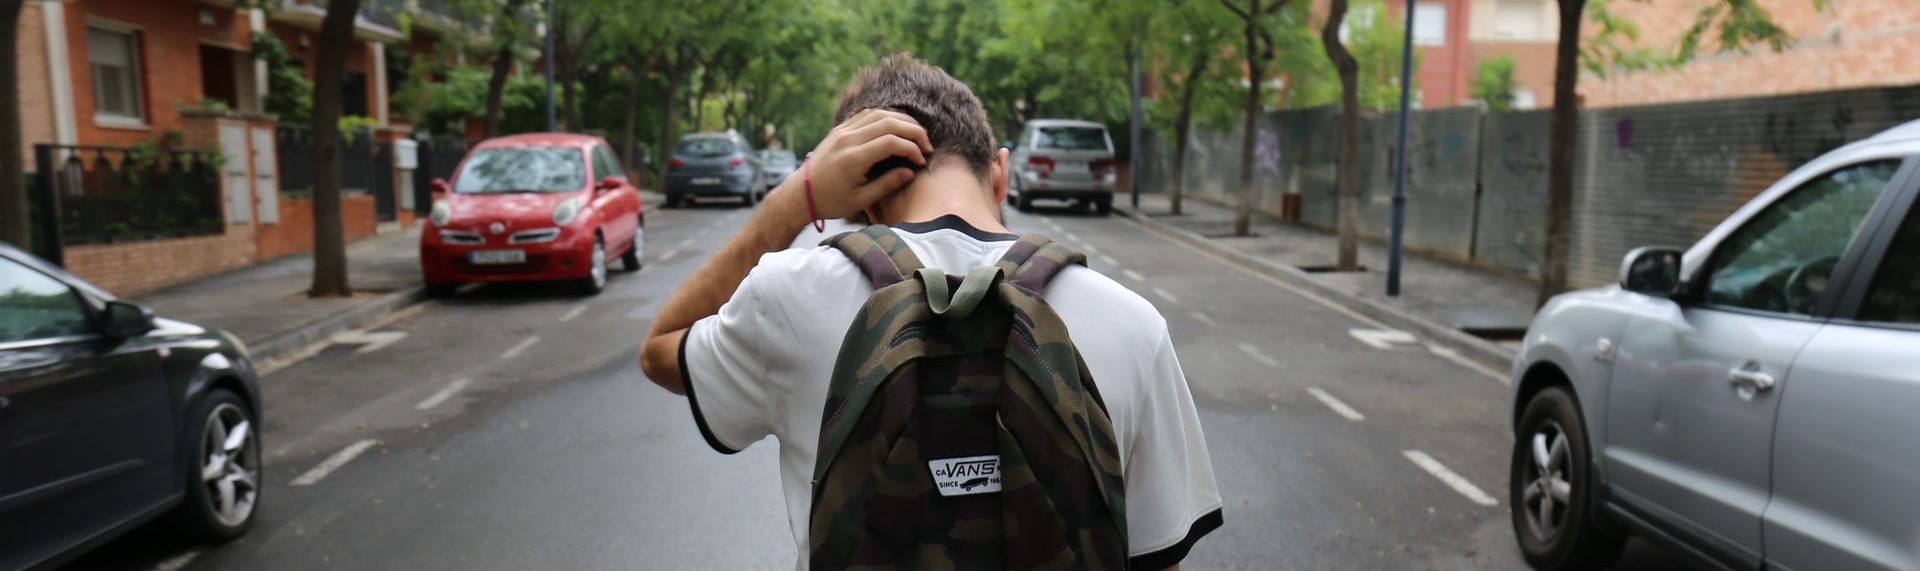 Michel Begues intevrnant de Solicaire pour les adolescents